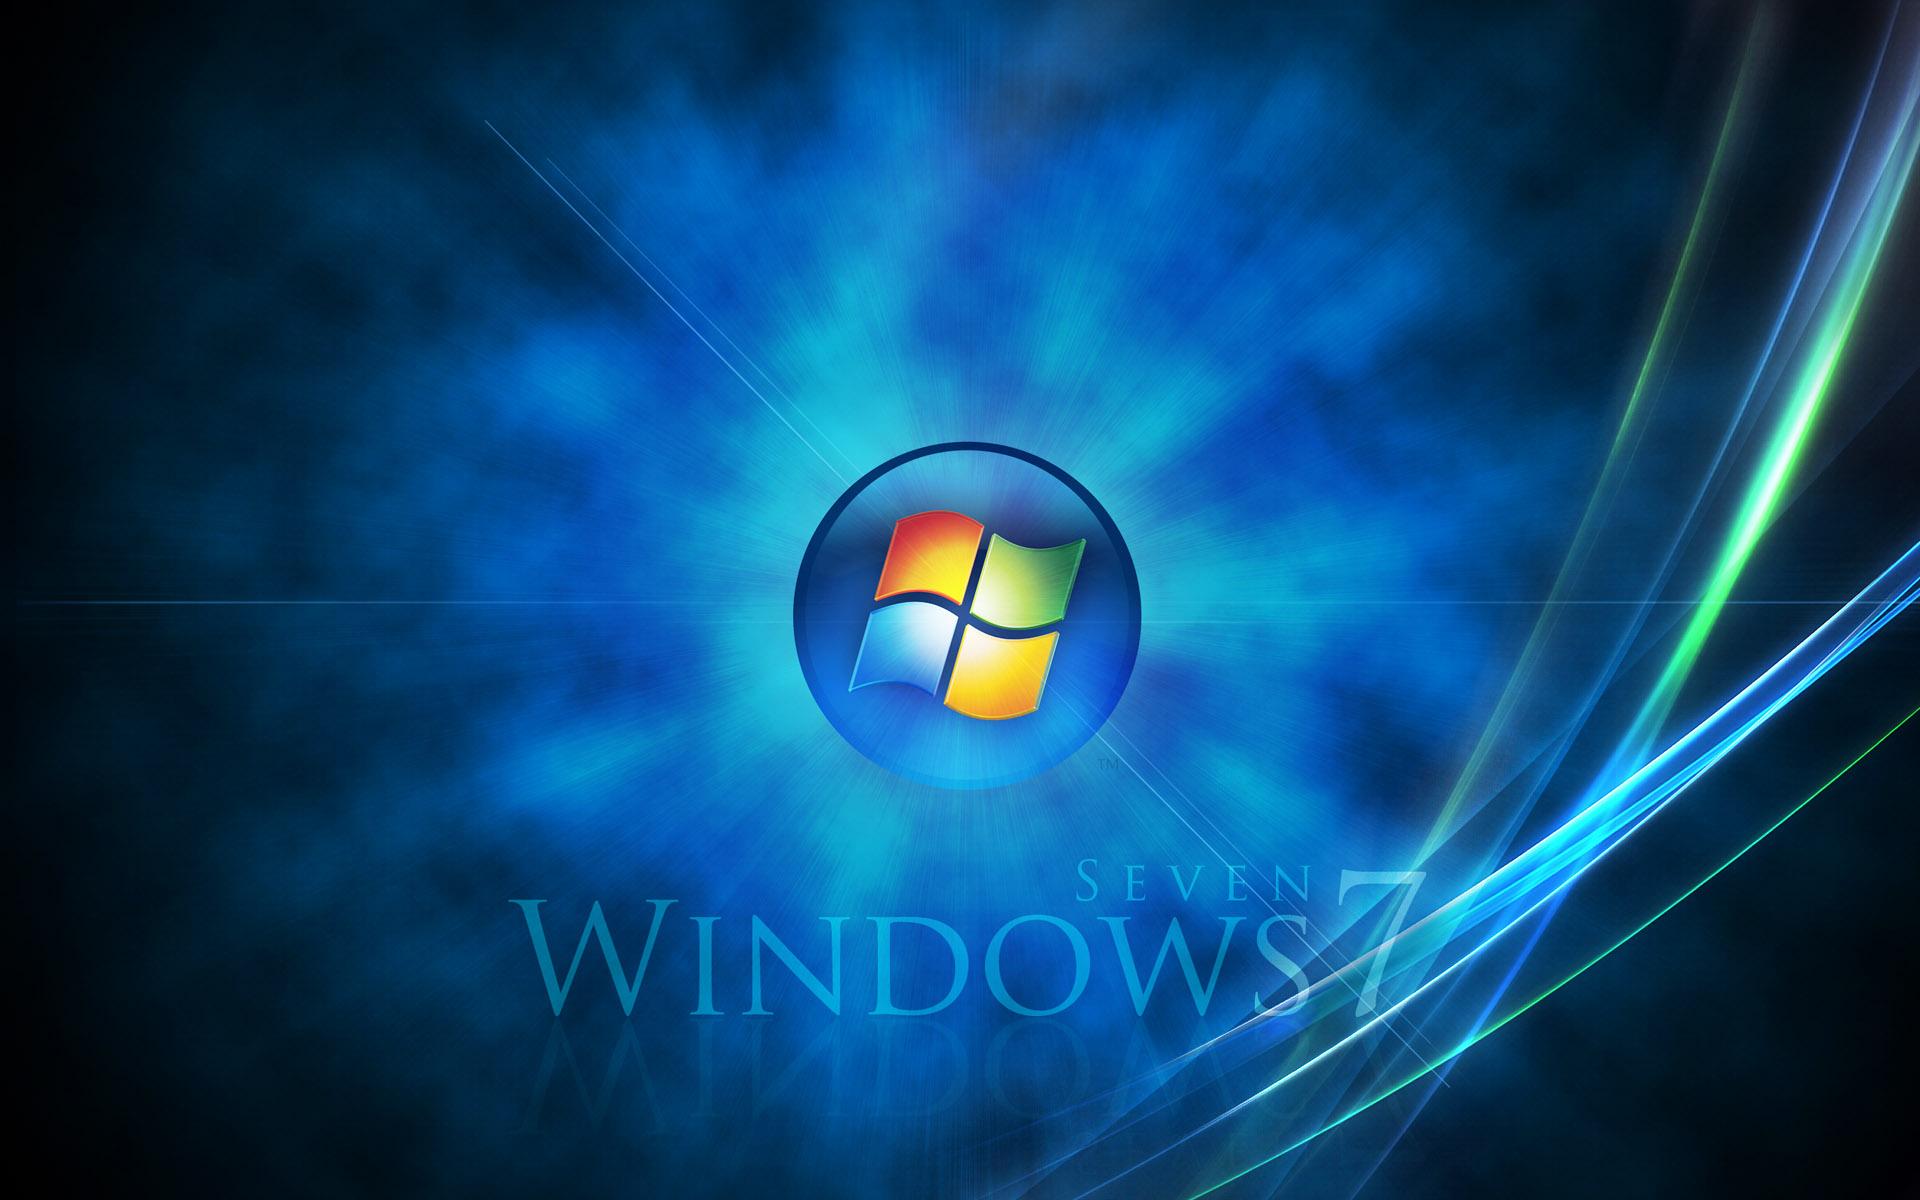 Black Wallpaper Windows 7 Starter Wallpaper Windows 7 Starter 1920x1200